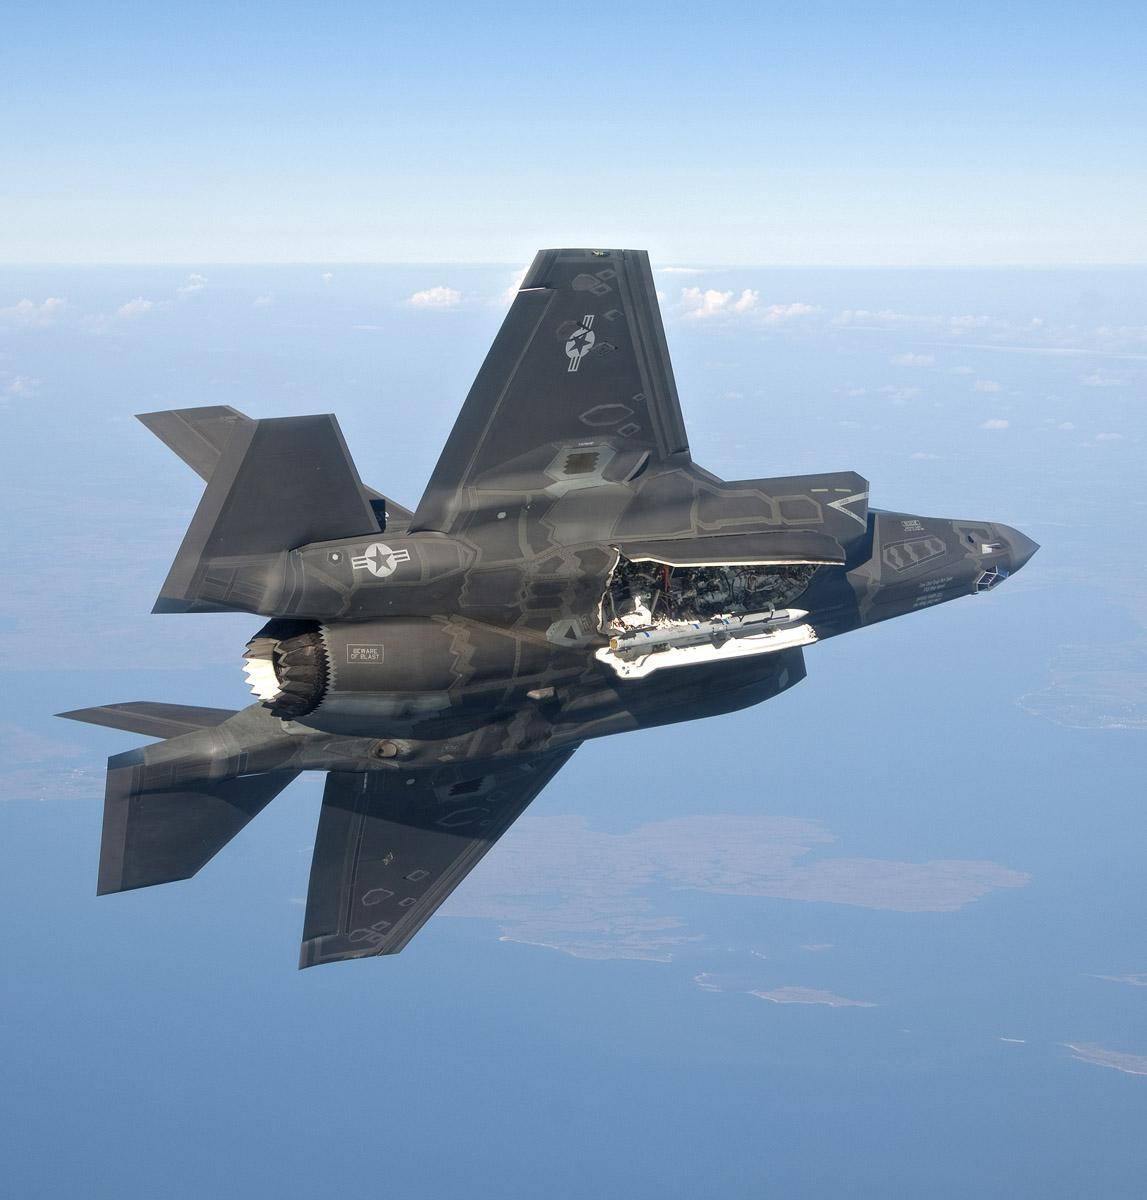 F 35 Internal Weapons Bay